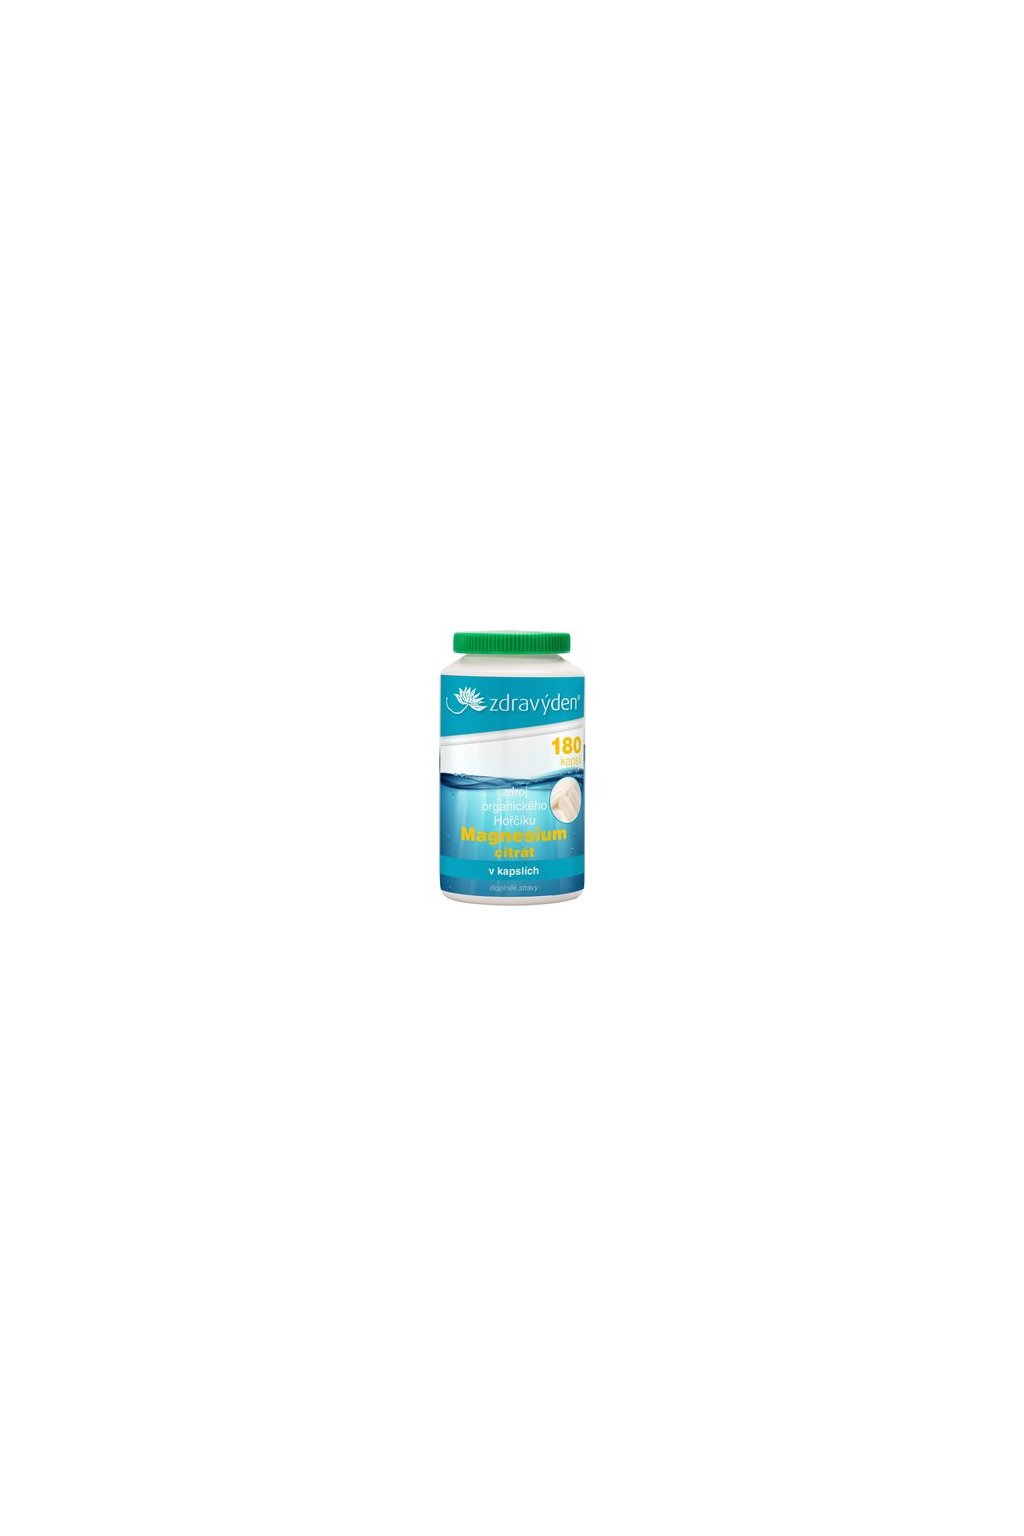 10235 zdravy den magnesium citrat 180 kapsli